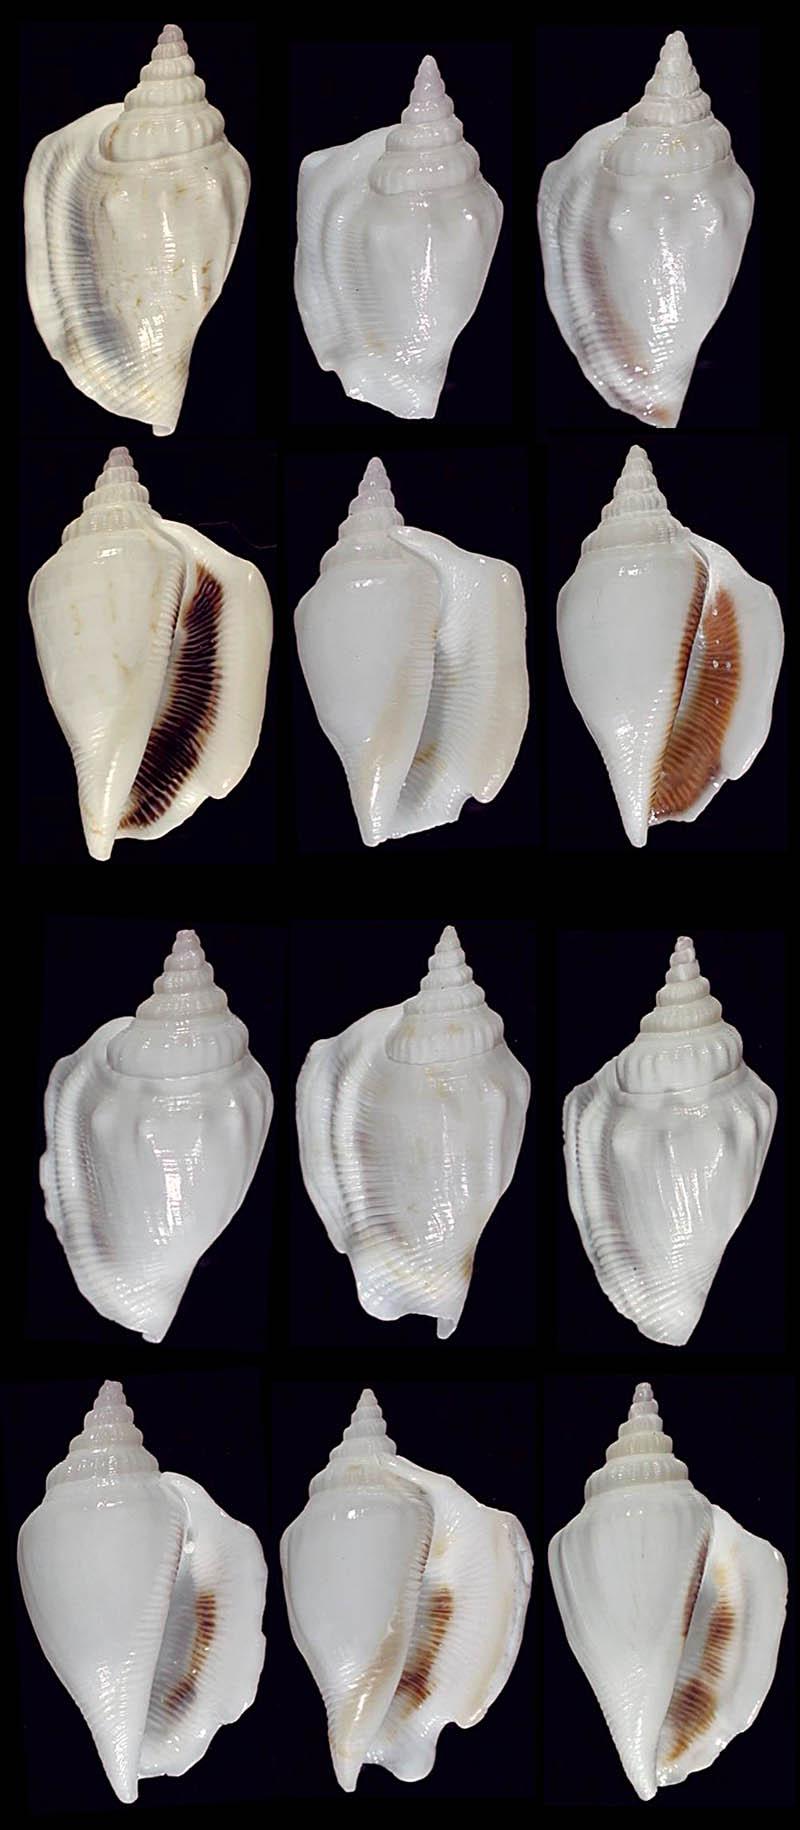 Dolomena columba lorenzi - T. Cossignani, 2020 Dolome12